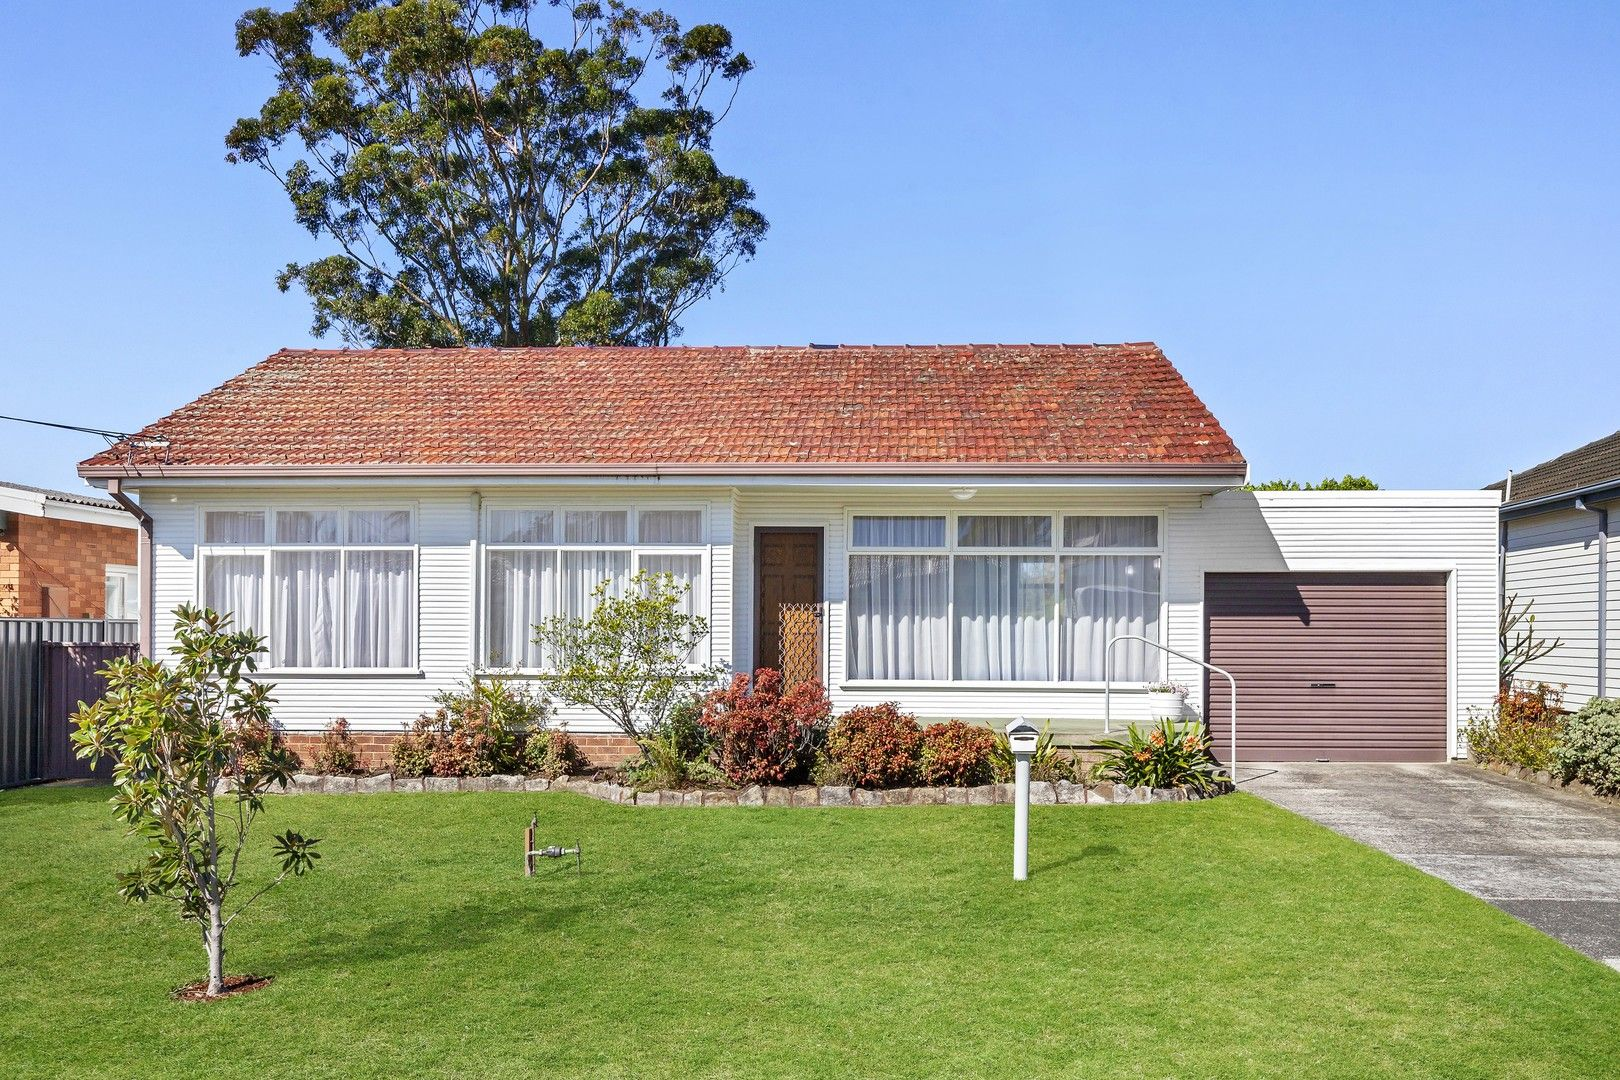 35 Balfour Street, Fairy Meadow NSW 2519, Image 0